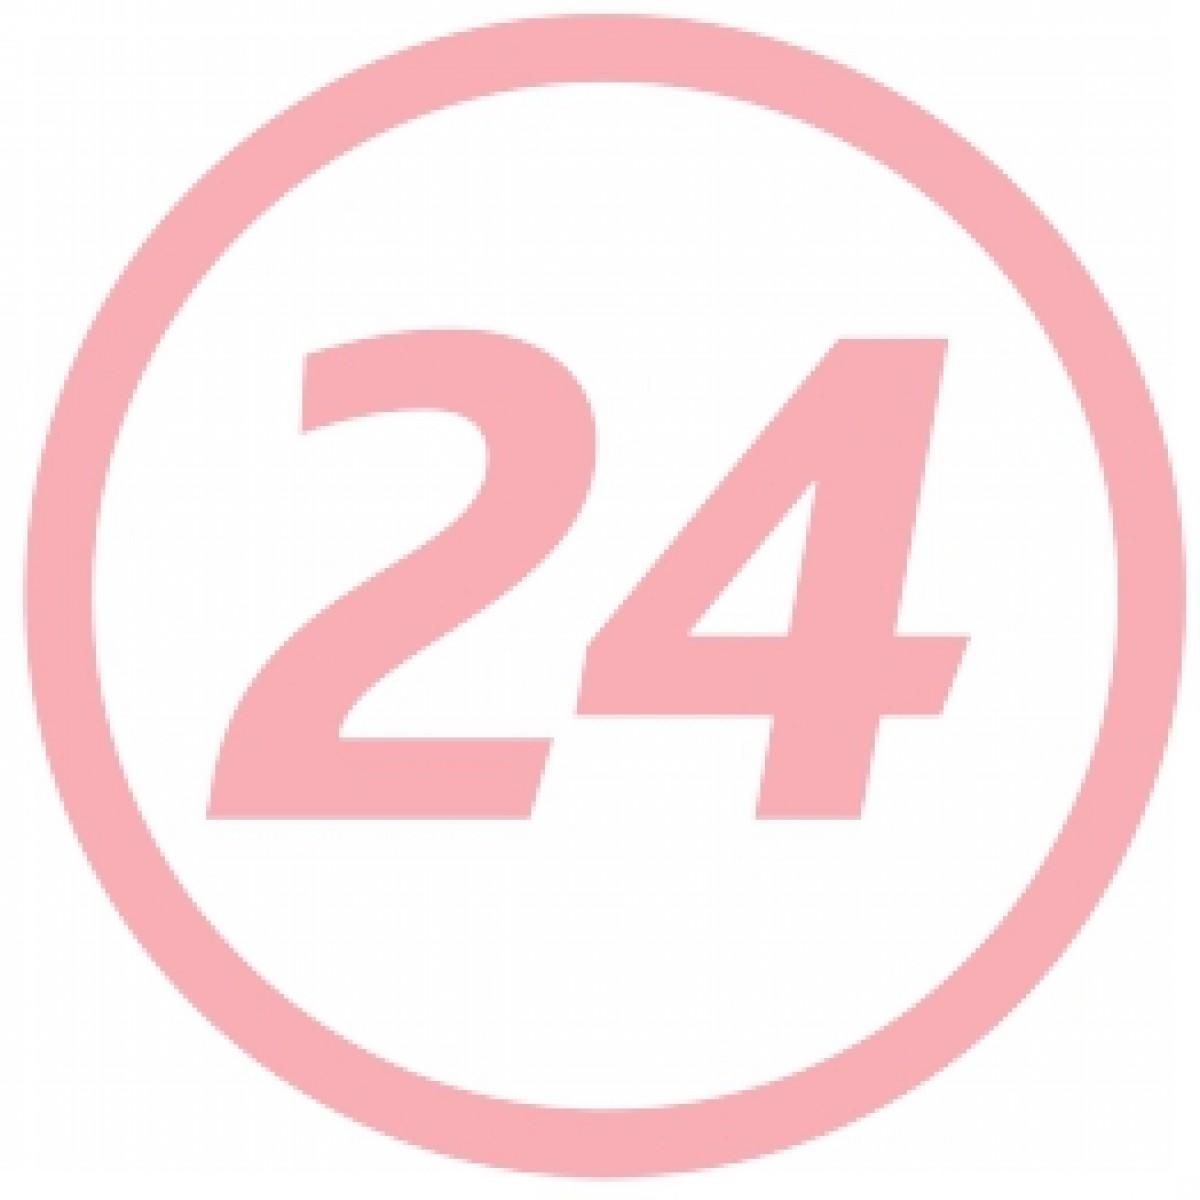 Patut Transformabil Silence Alb-Portocaliu Cu Leg 4252